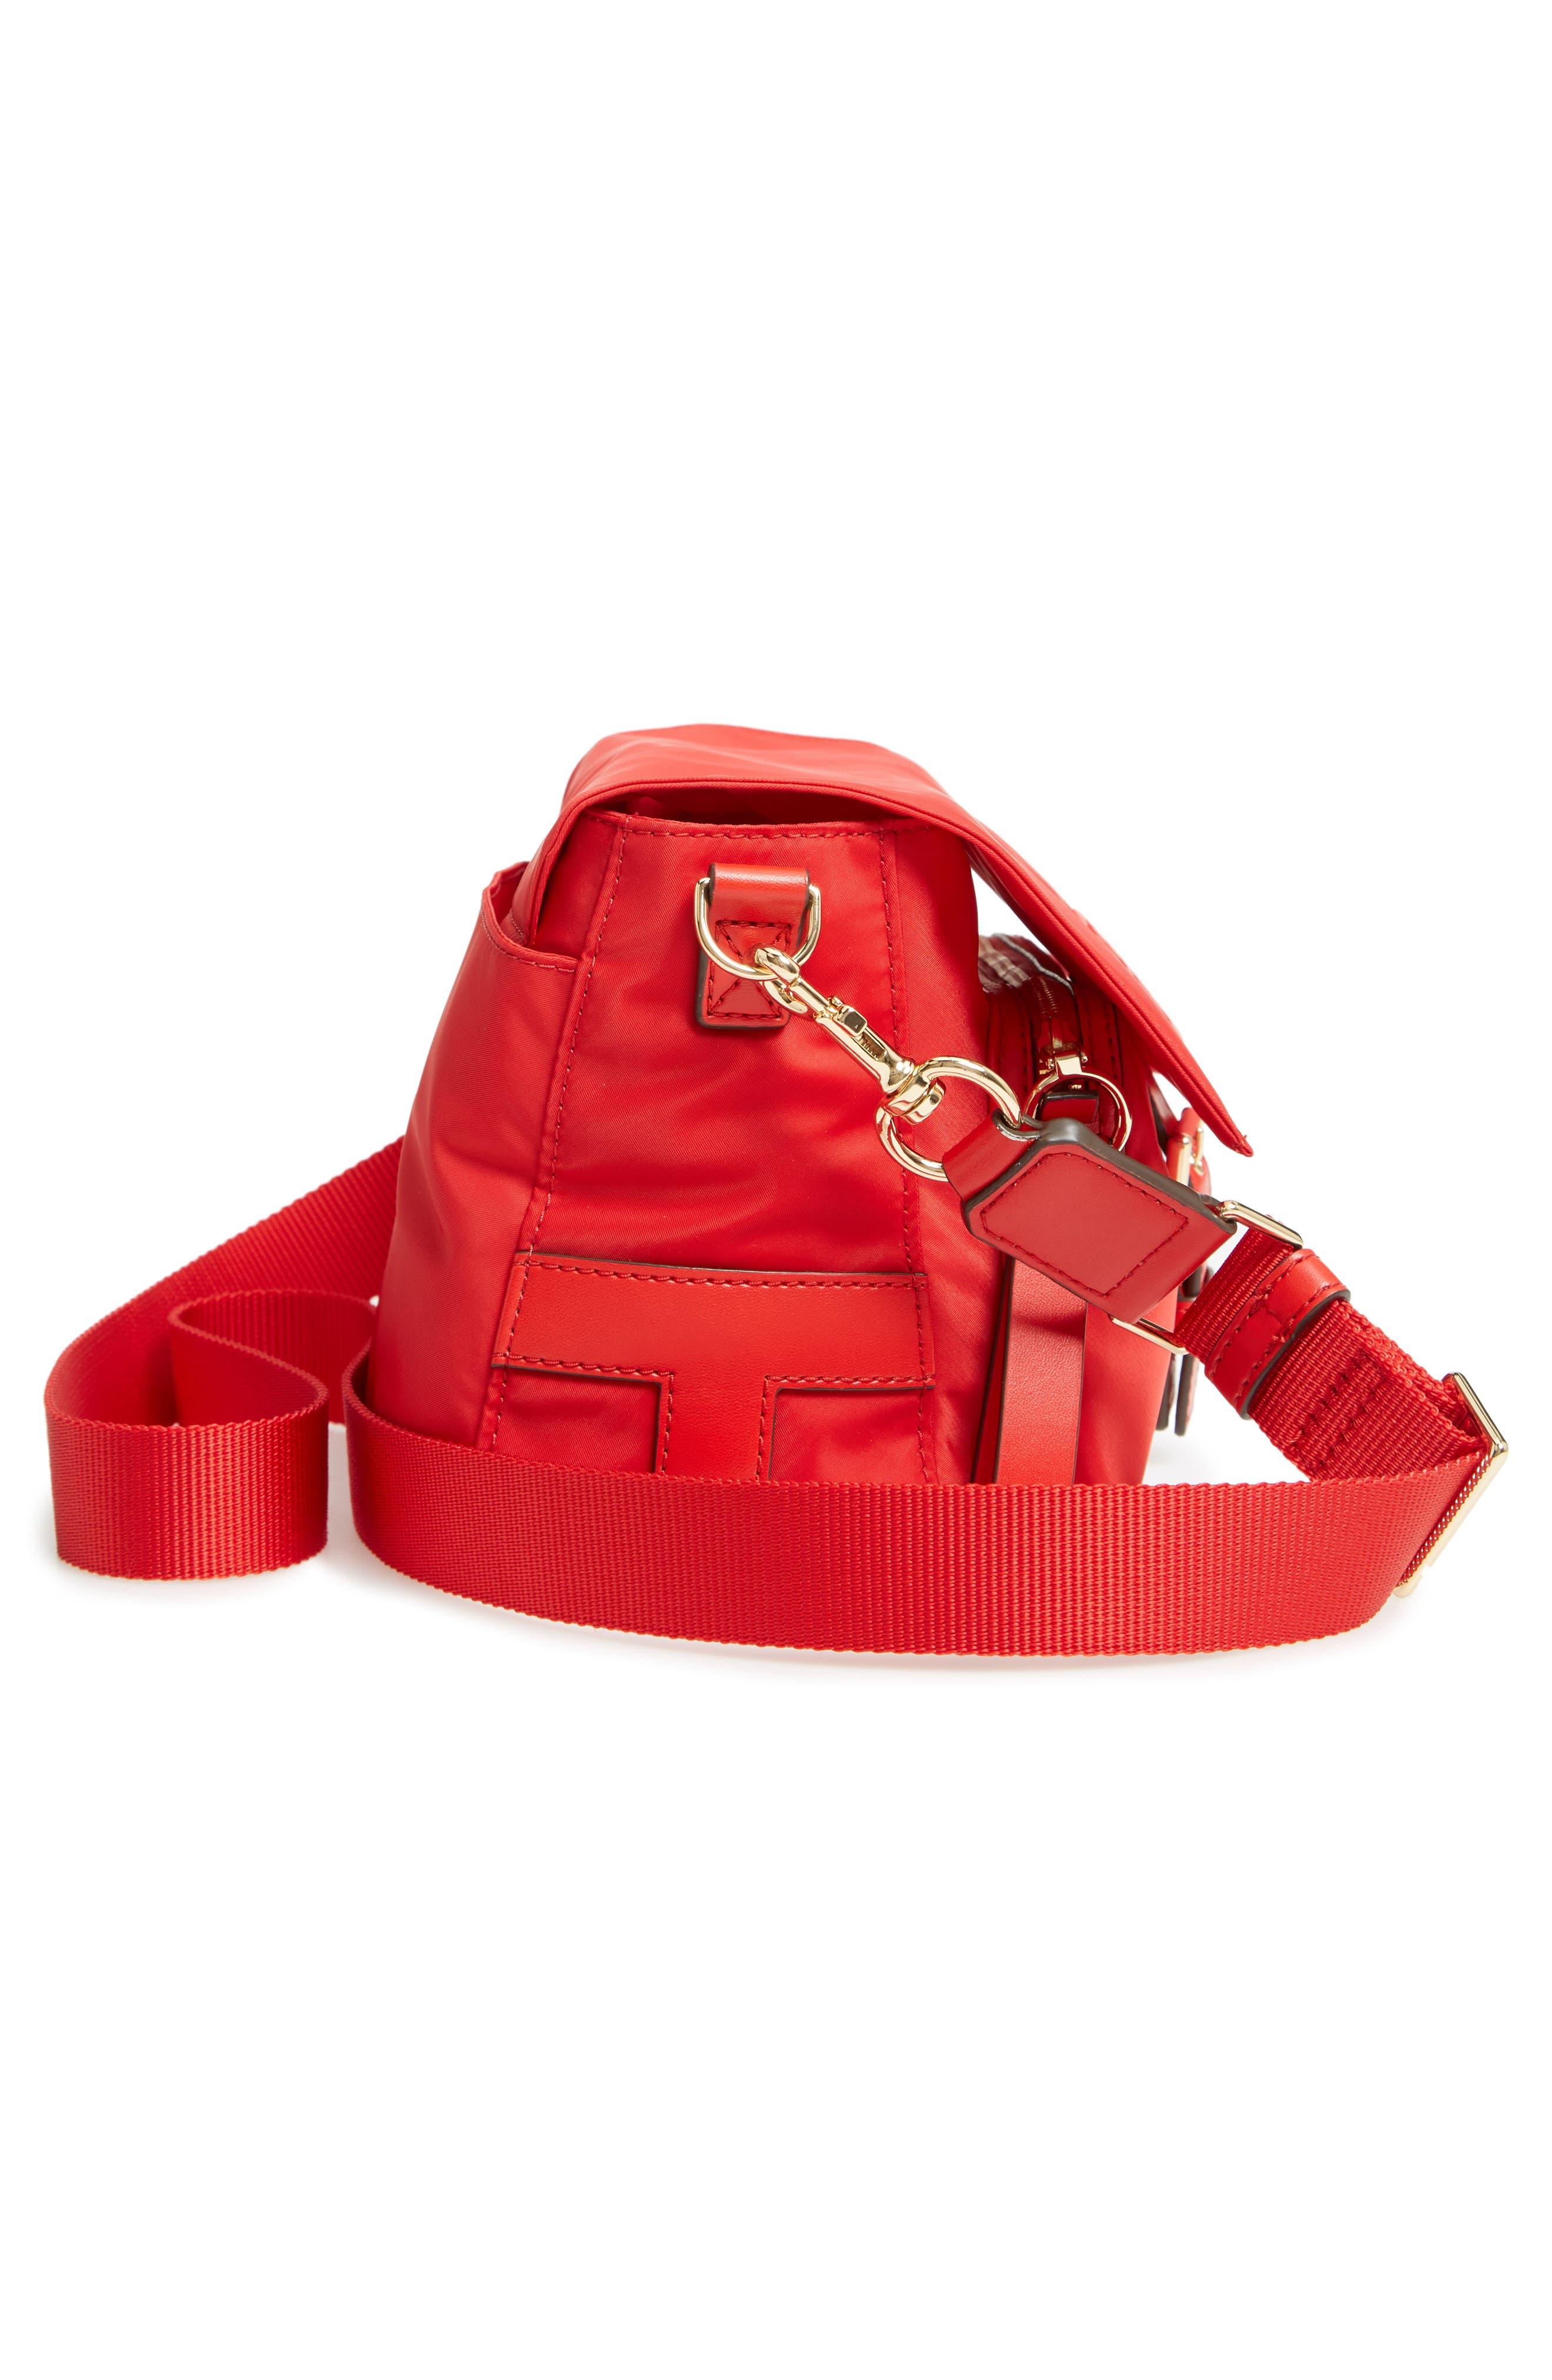 Tilda Nylon Crossbody Bag,                             Alternate thumbnail 6, color,                             BRILLIANT RED